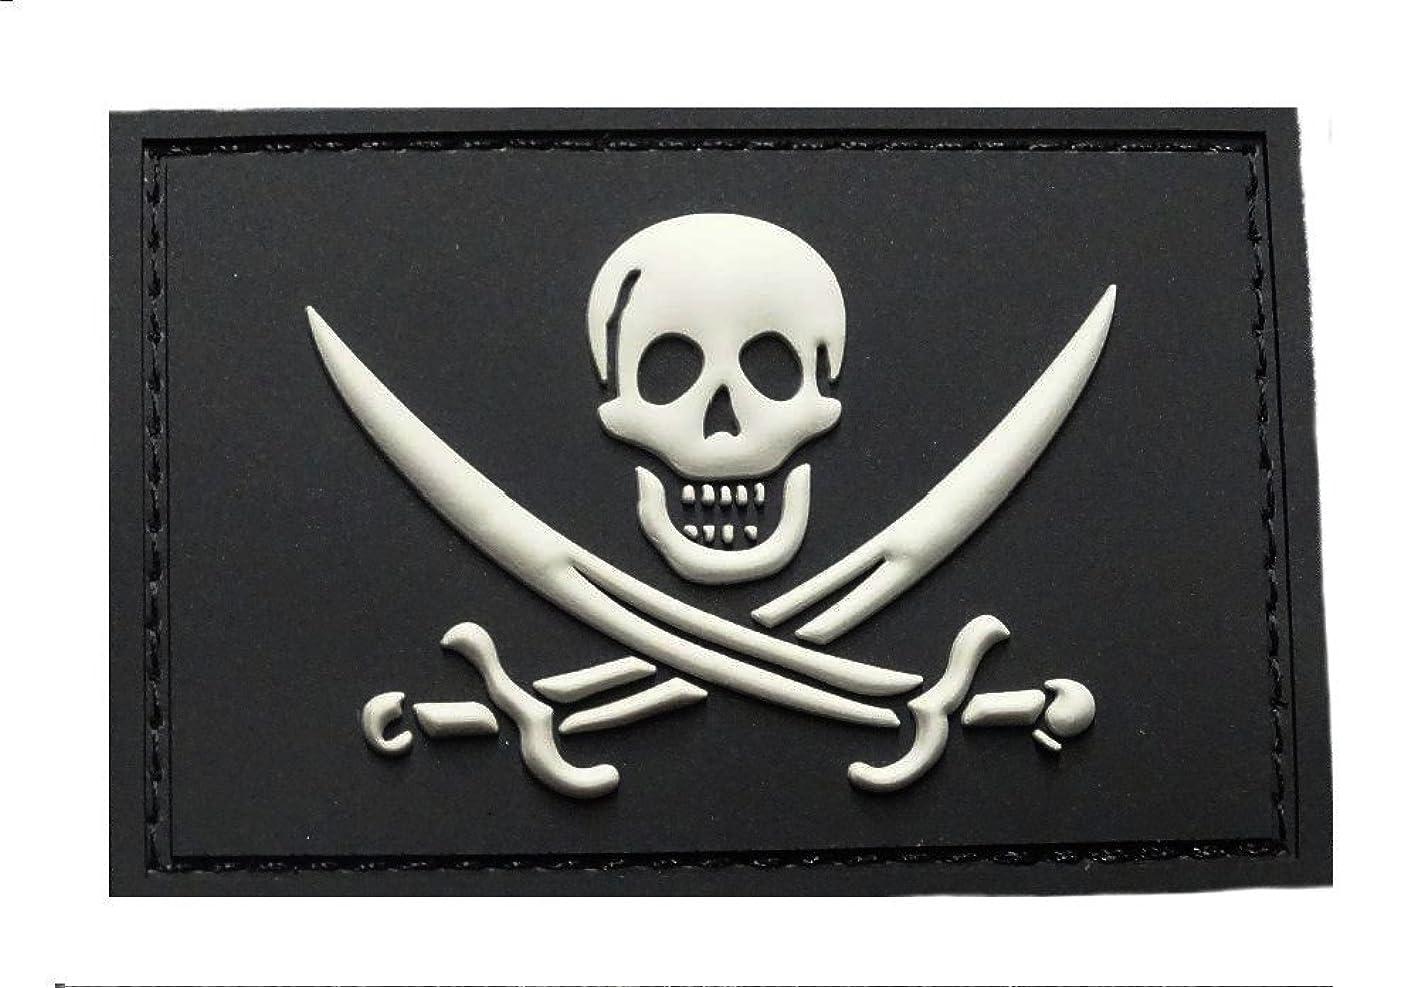 Jolly Roger Calico Jack PVC Rubber Morale Hook PVC Patch